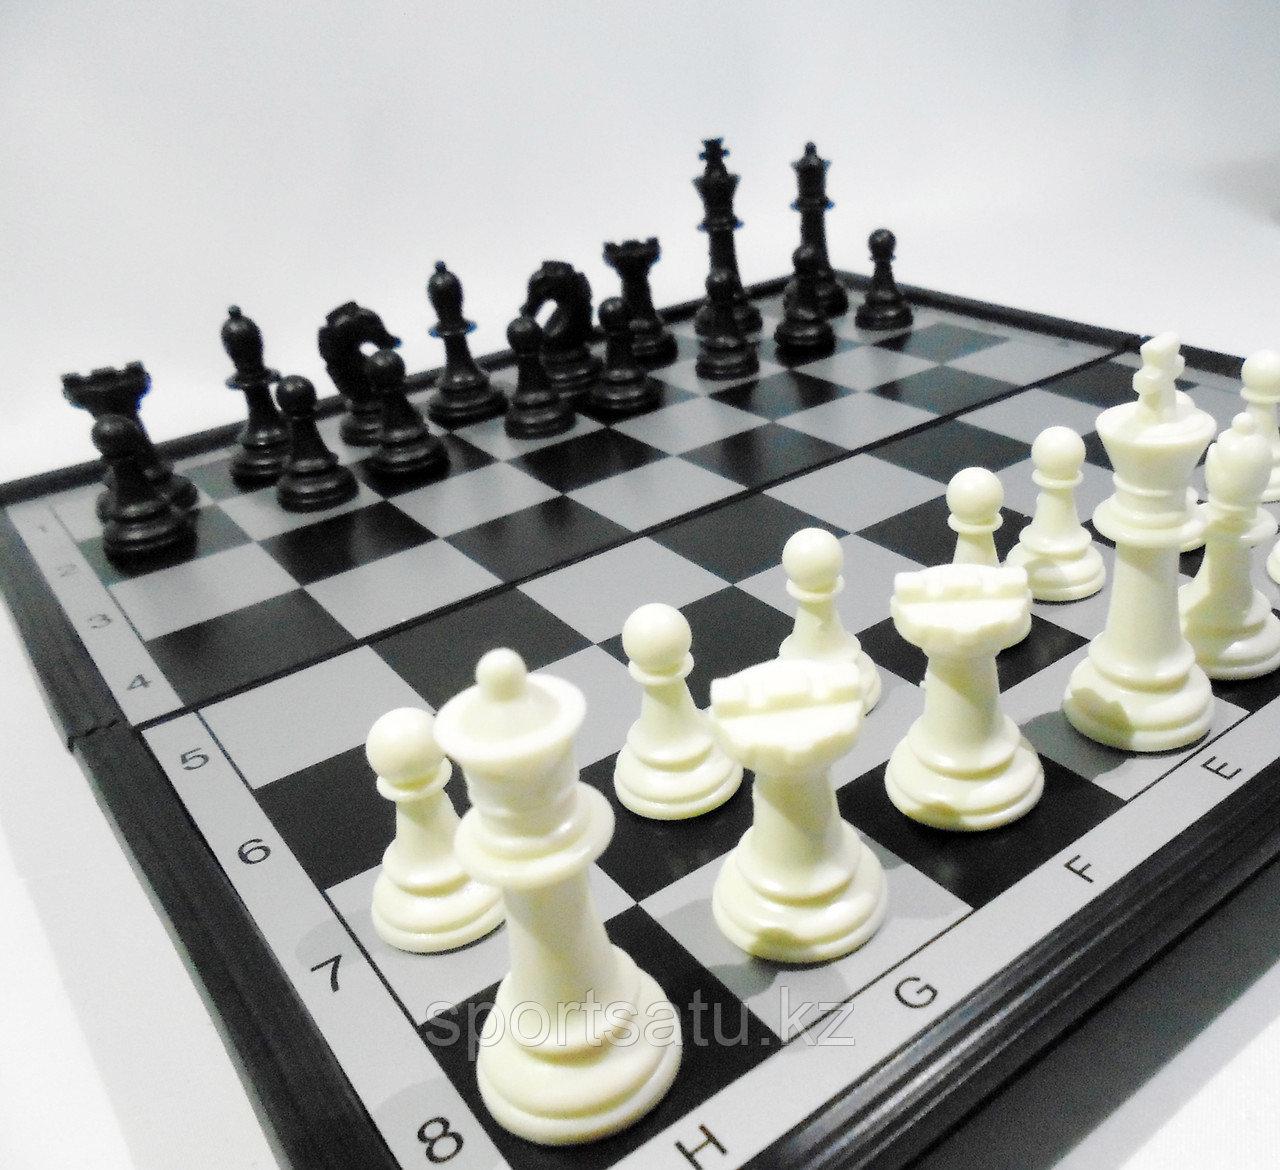 Магнитные шахматы  24см X 24см